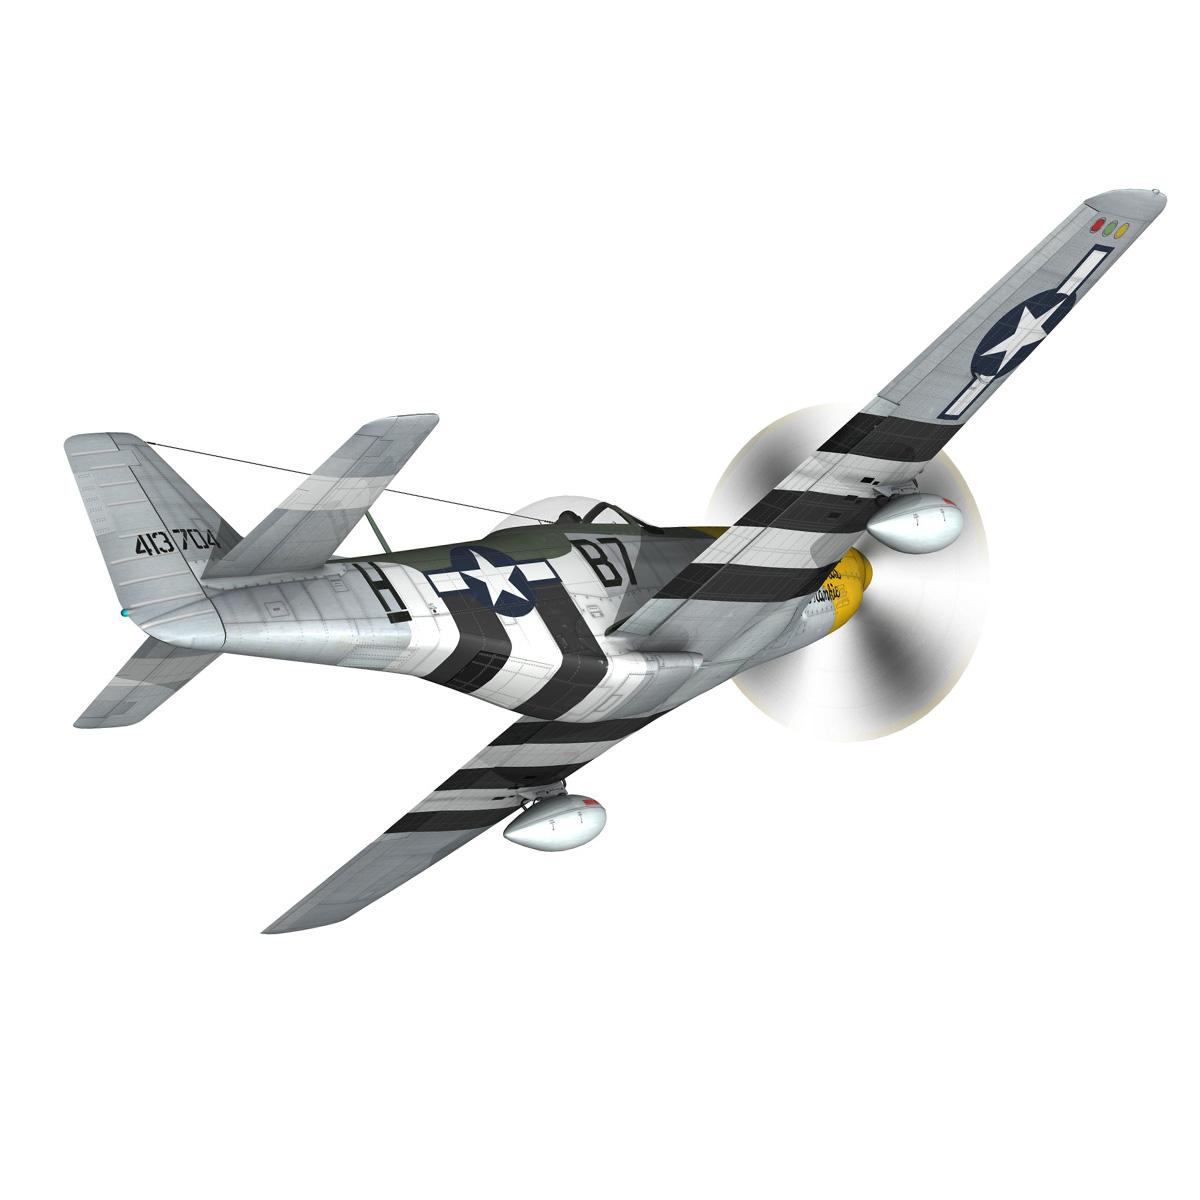 north american p-51d mustang – ferocious frankie 3d model fbx c4d lwo obj 269491